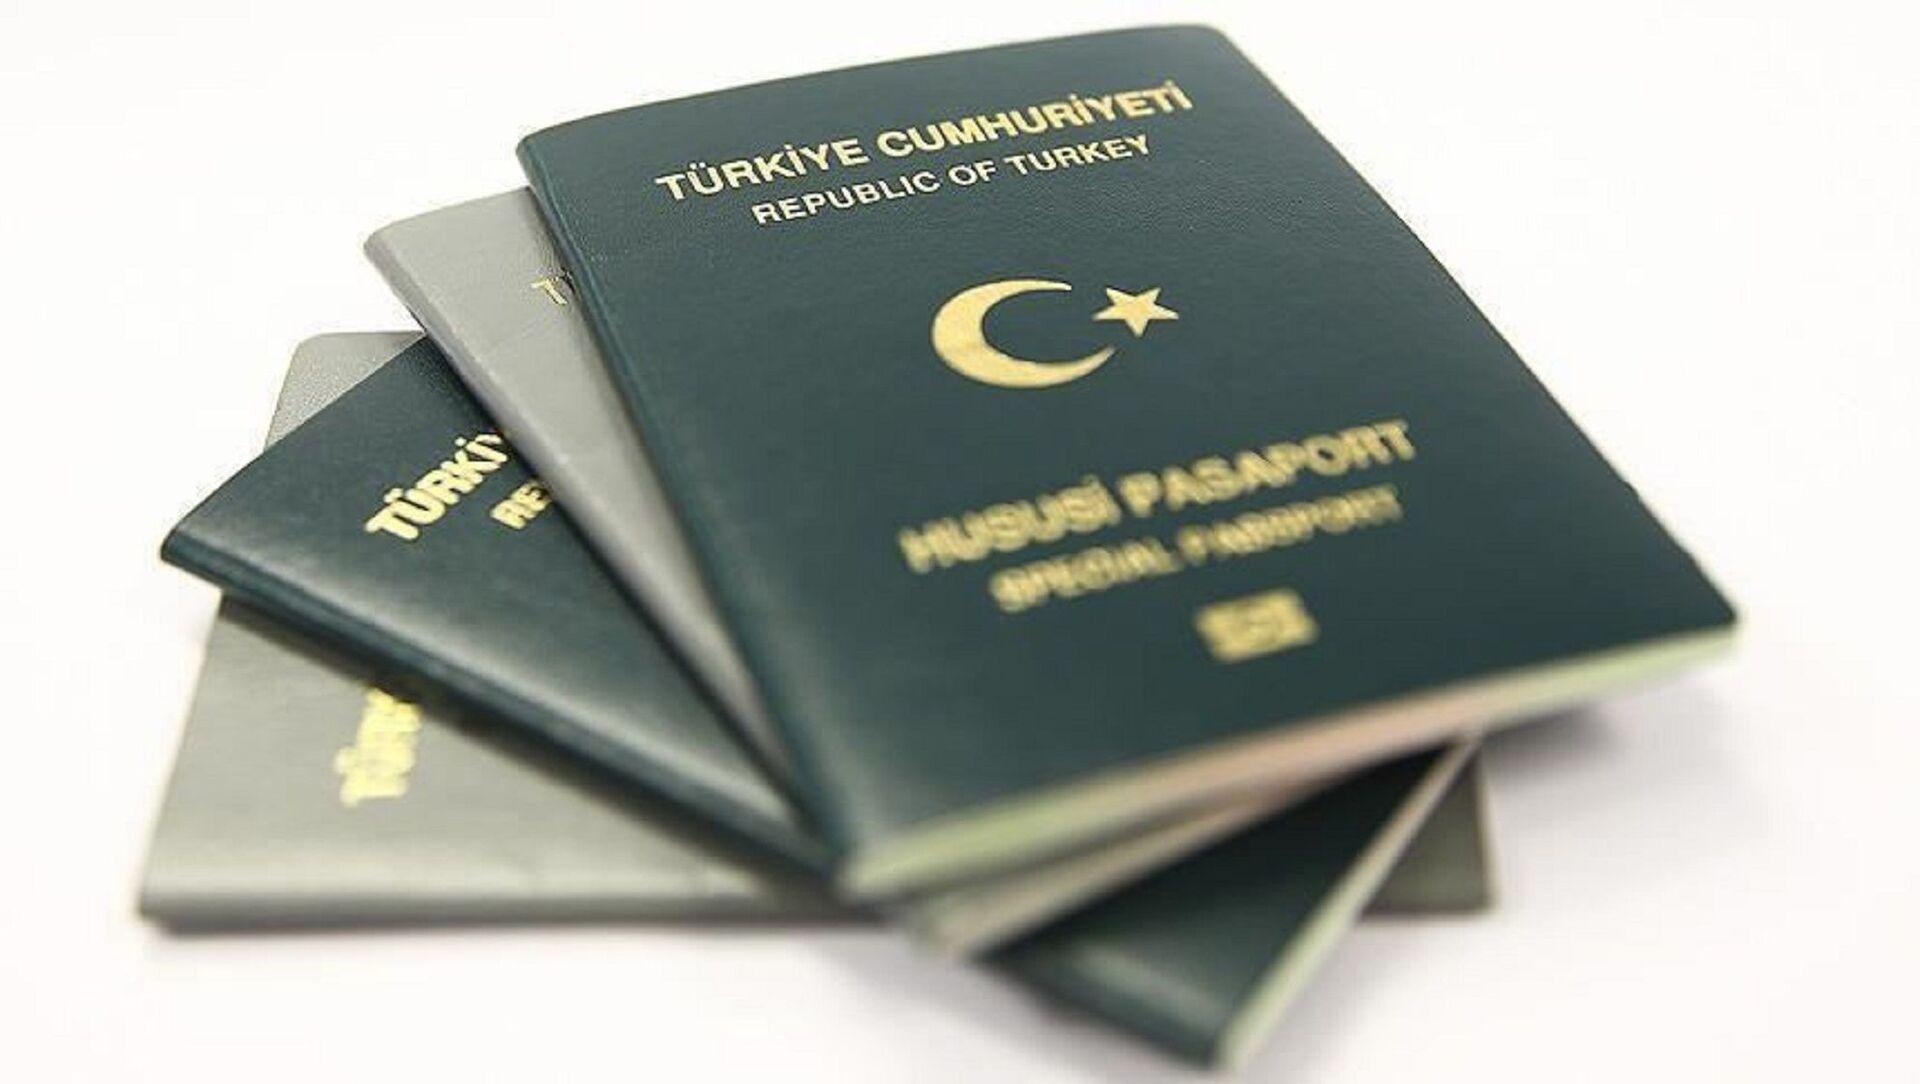 pasaport - Sputnik Türkiye, 1920, 20.04.2021